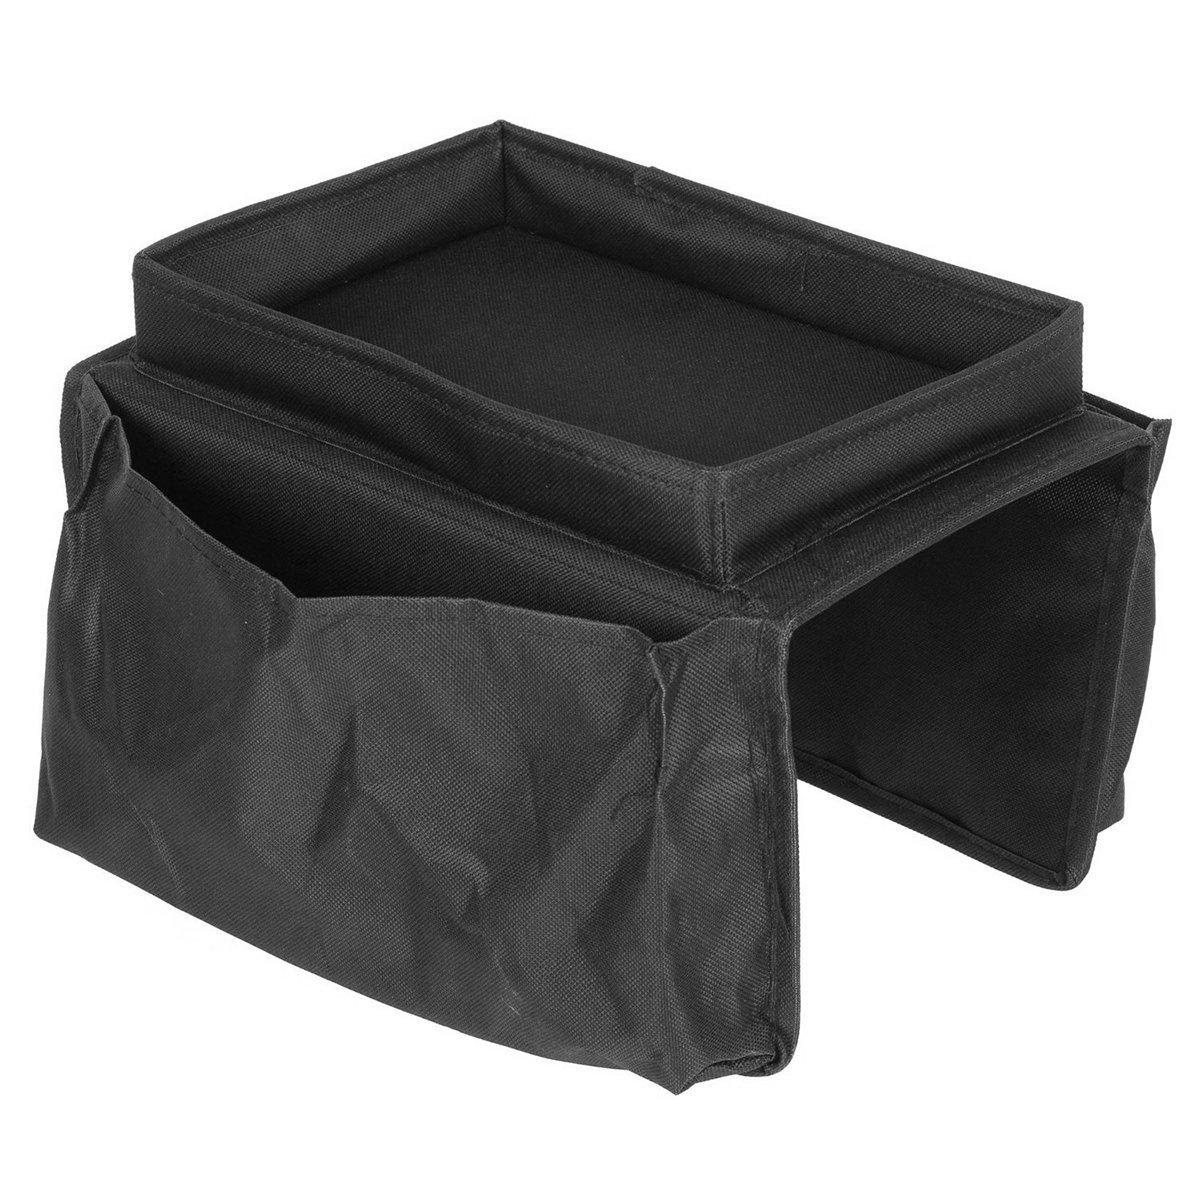 LONGQI Sofa Storage Bags mit Tablett Multifunktional Kleine Objekt Speicher